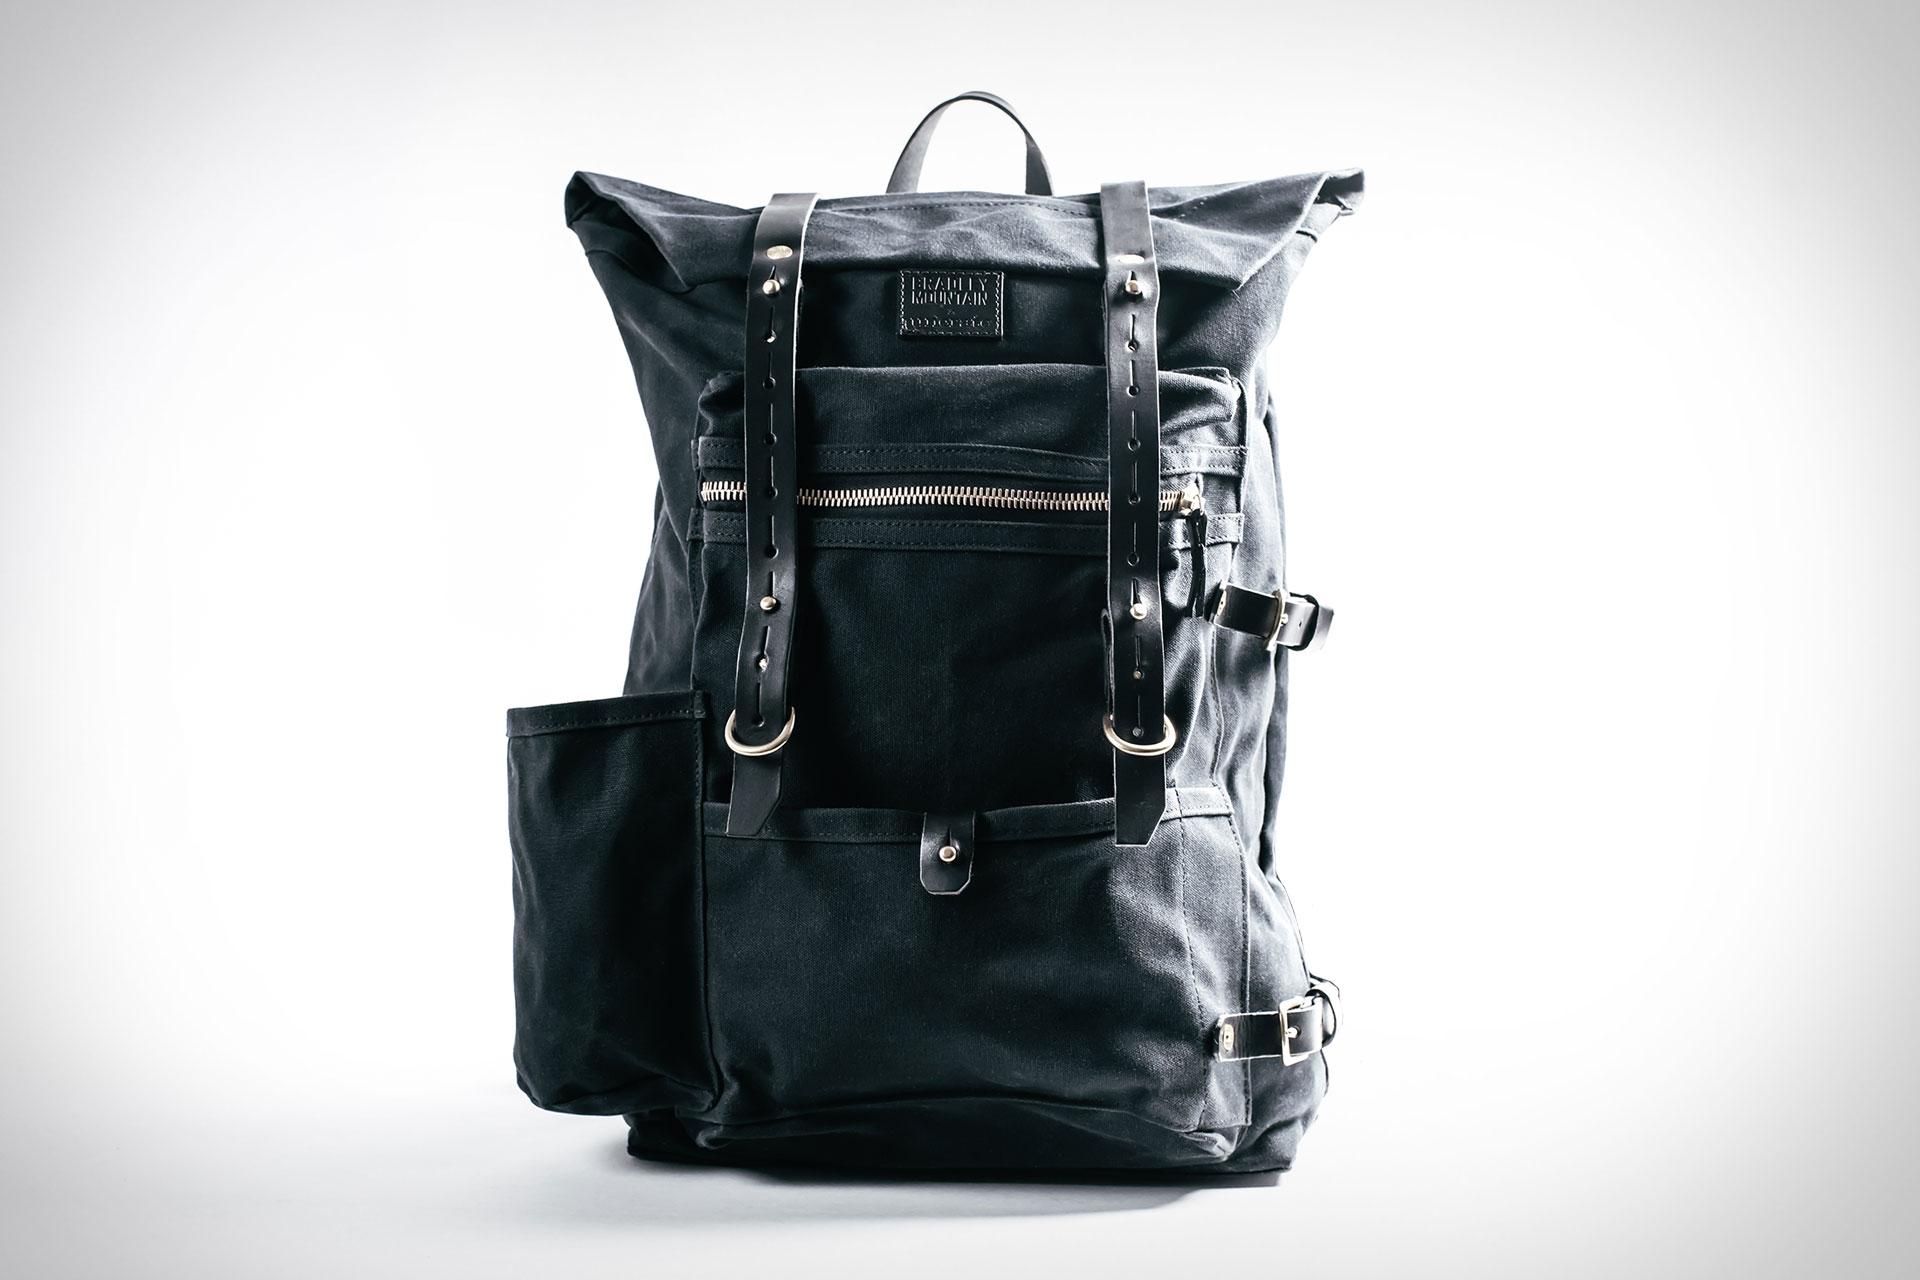 Bradley Mountain x Uncrate Wilder Backpack